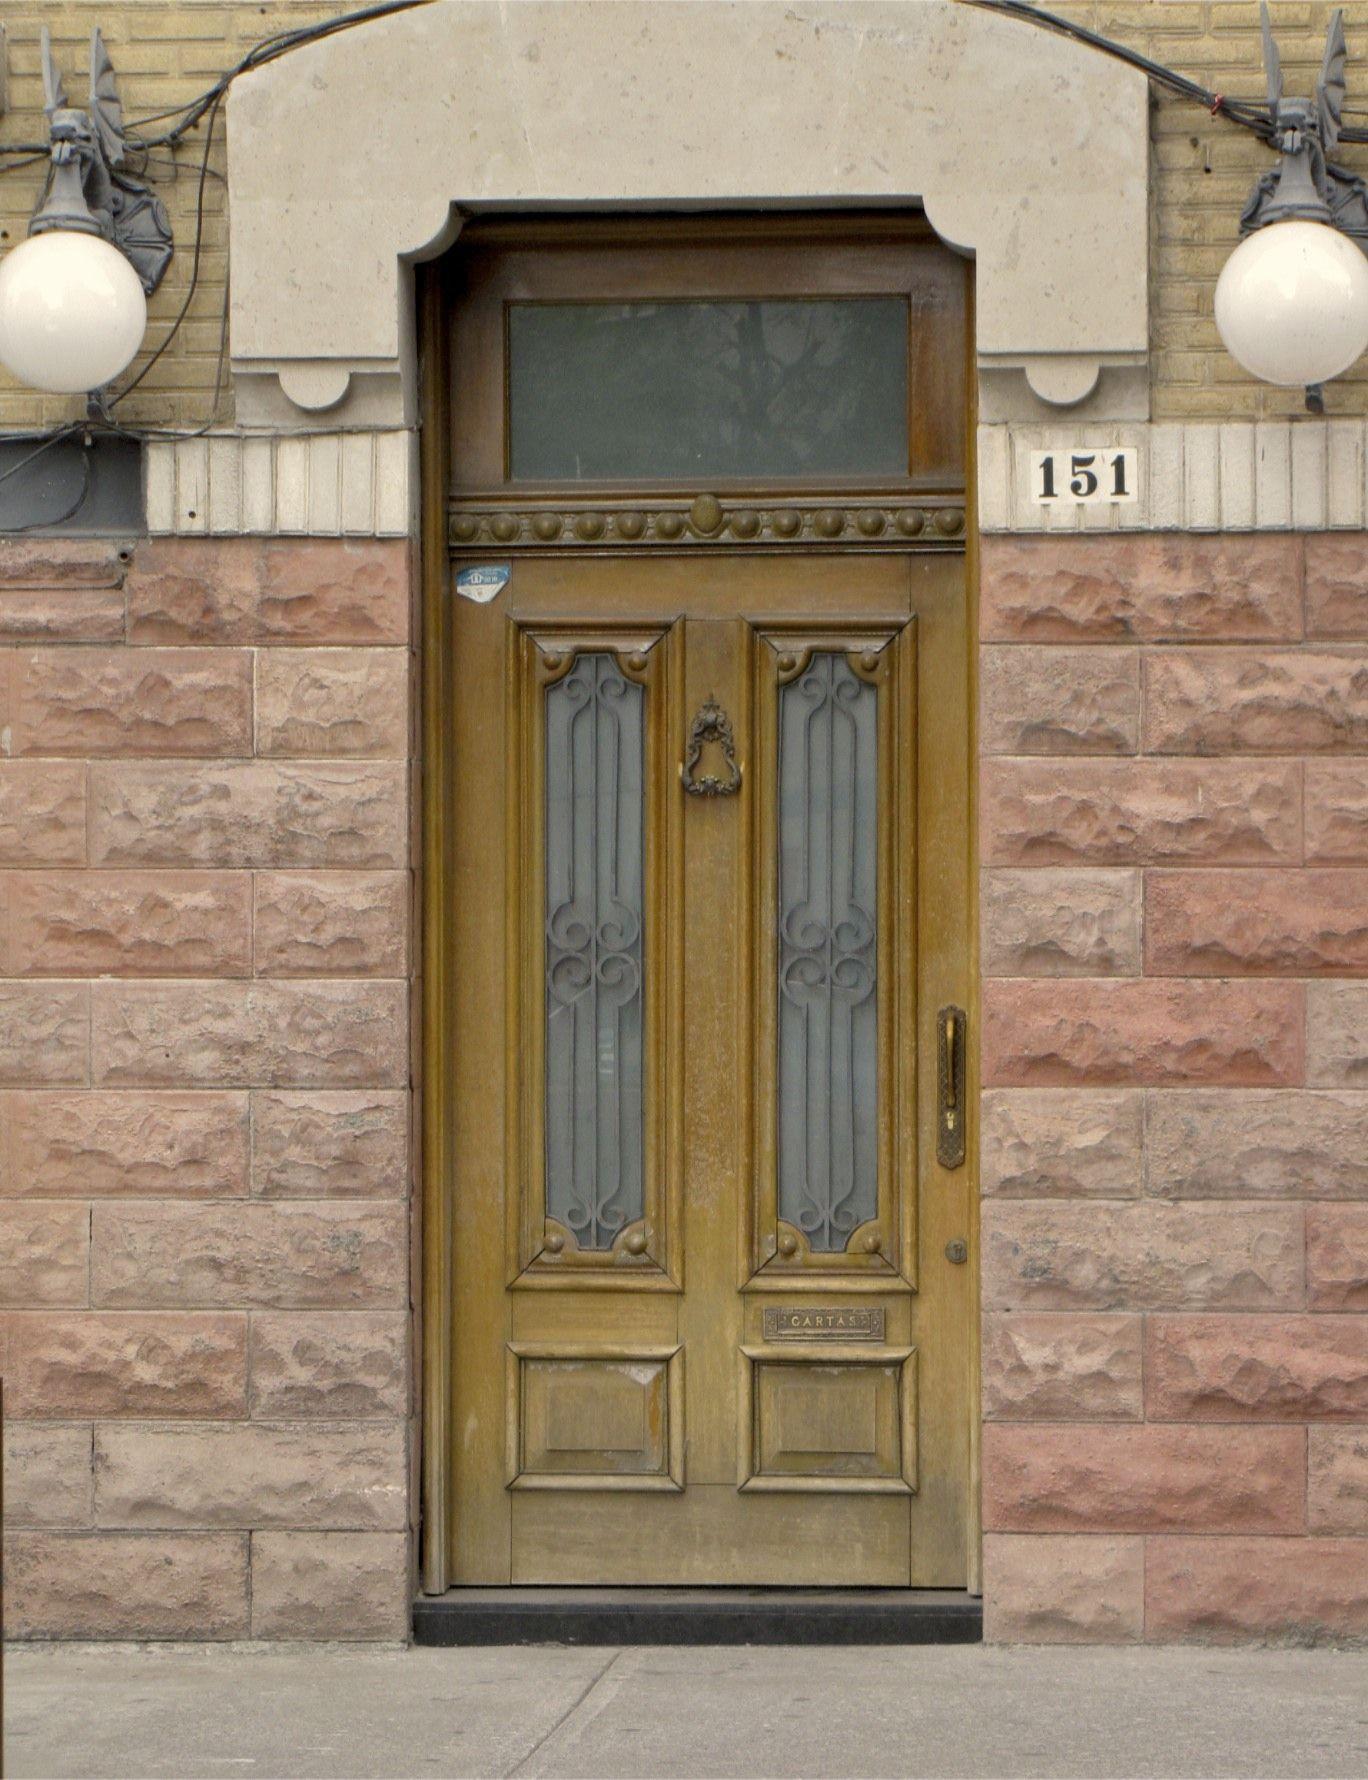 Door in Roma Norte, Mexico City D.F.   Photo by Linda Janse